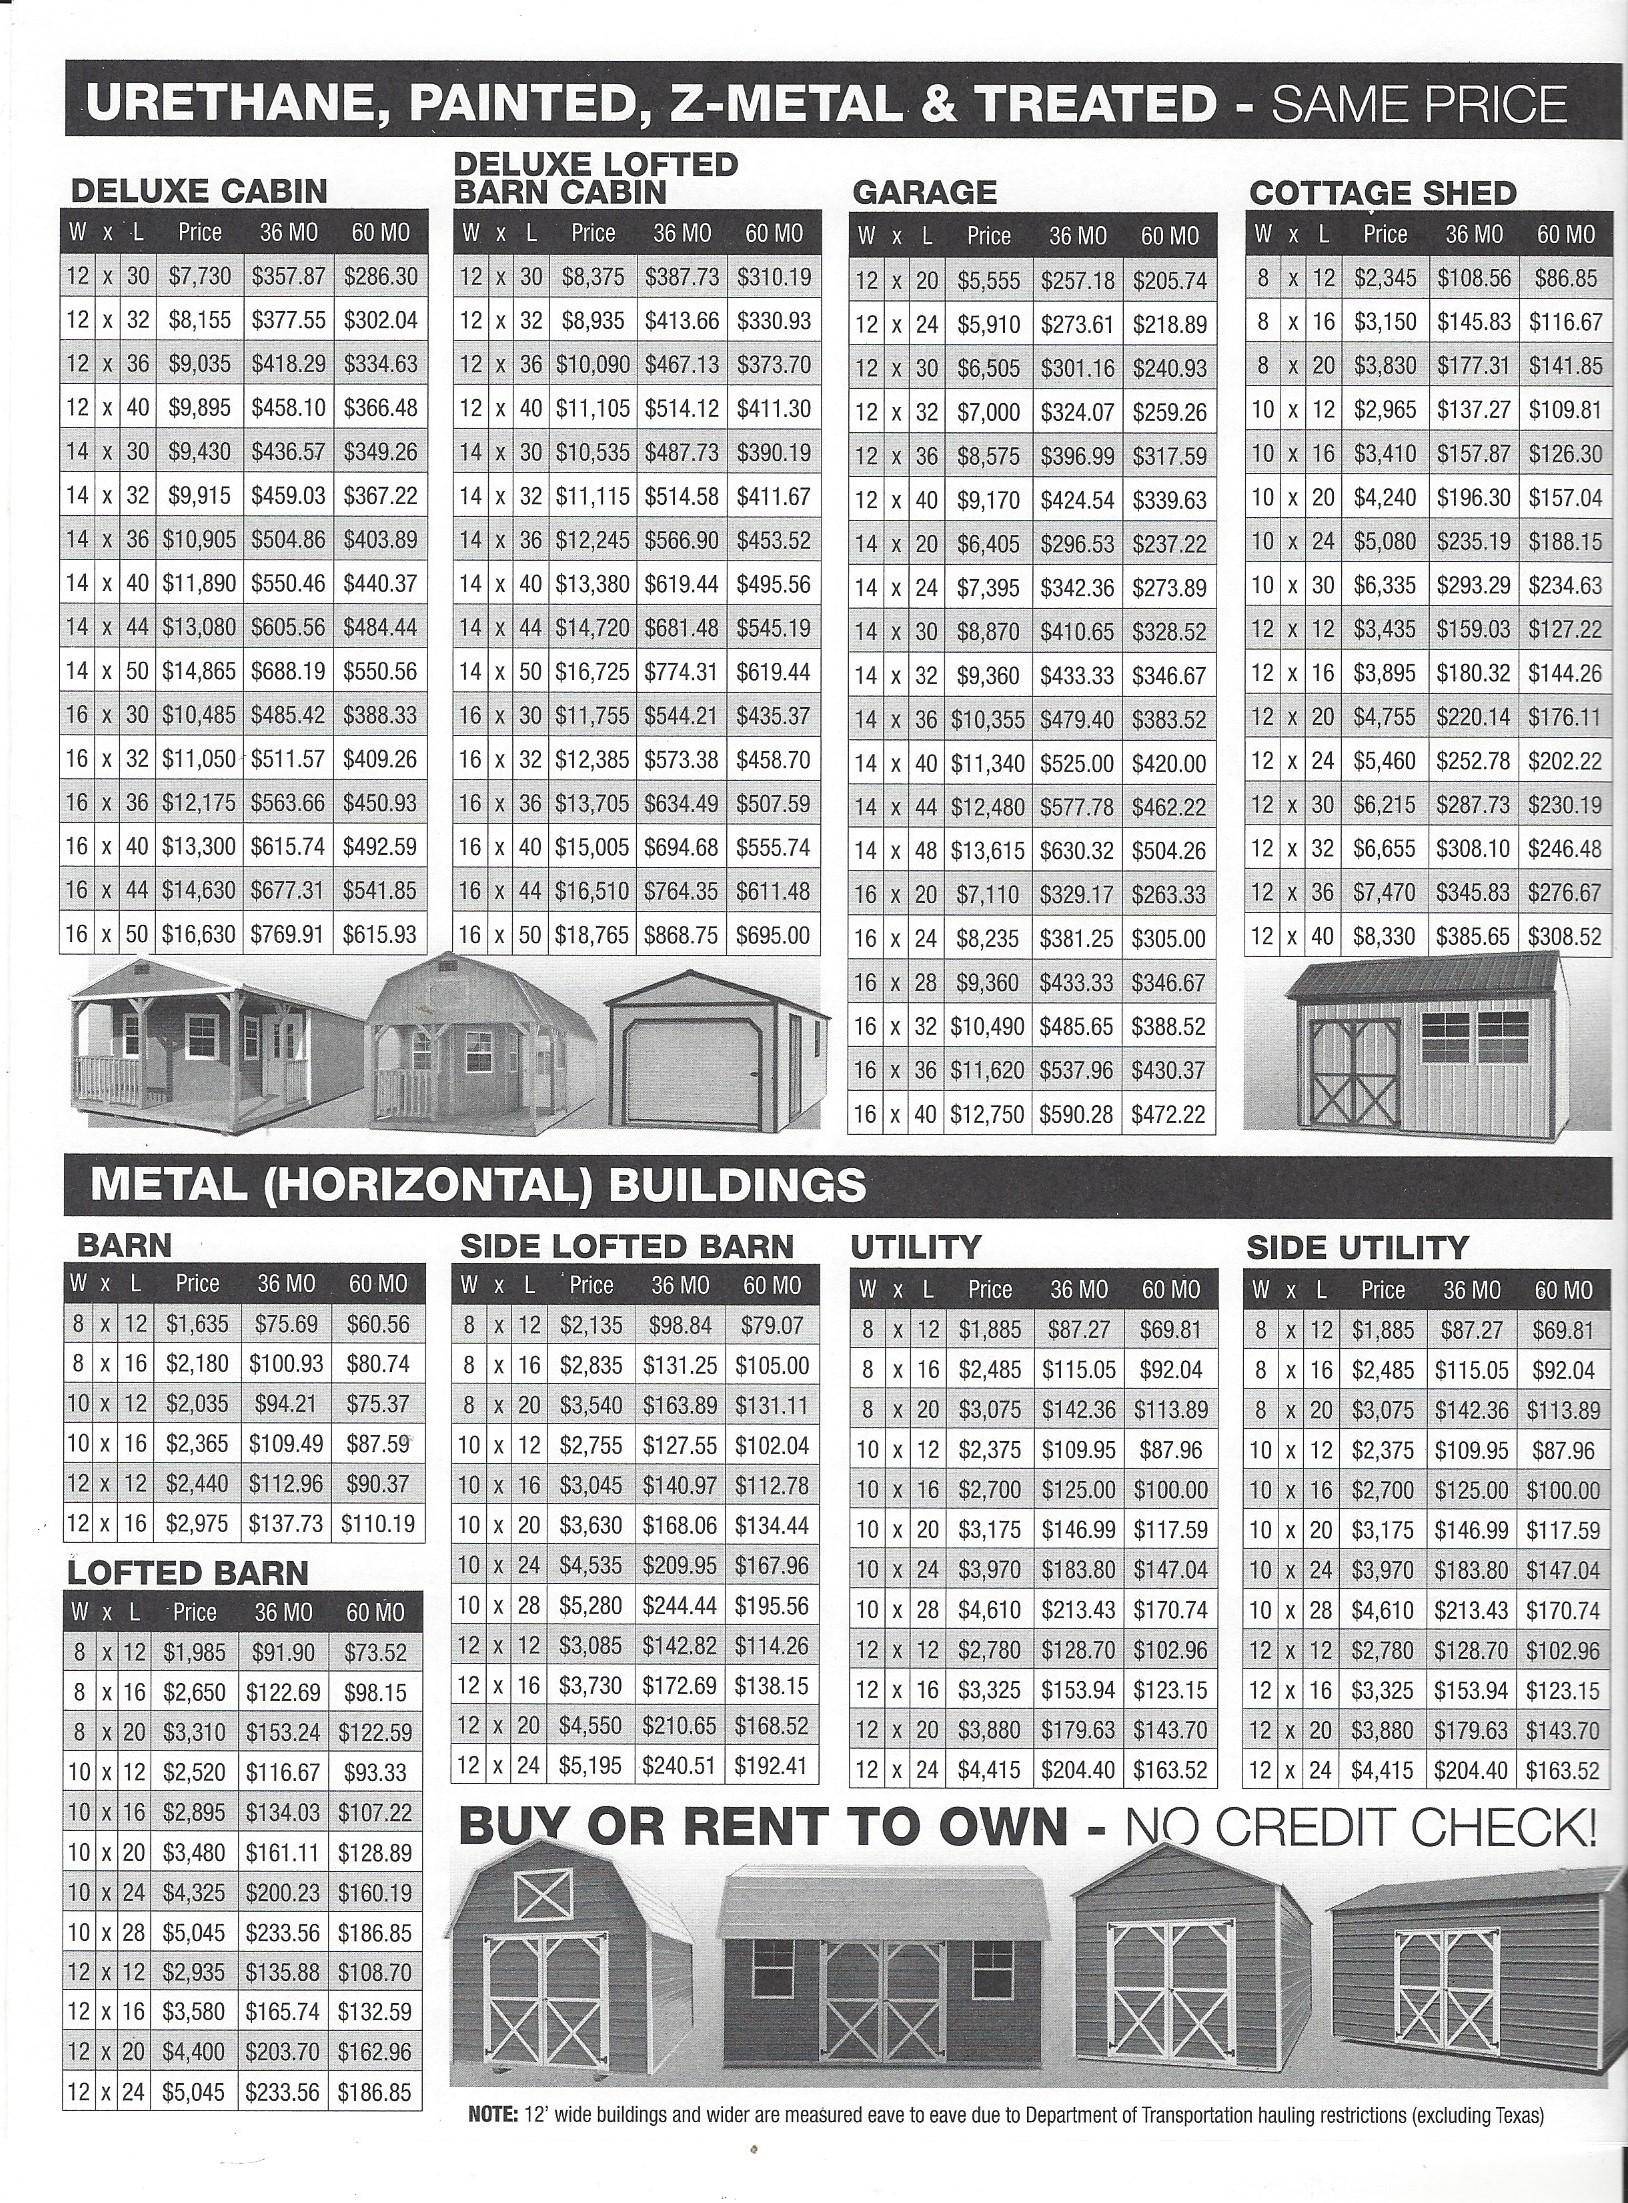 Derksen Storage Prices Sealy Portable Buildings